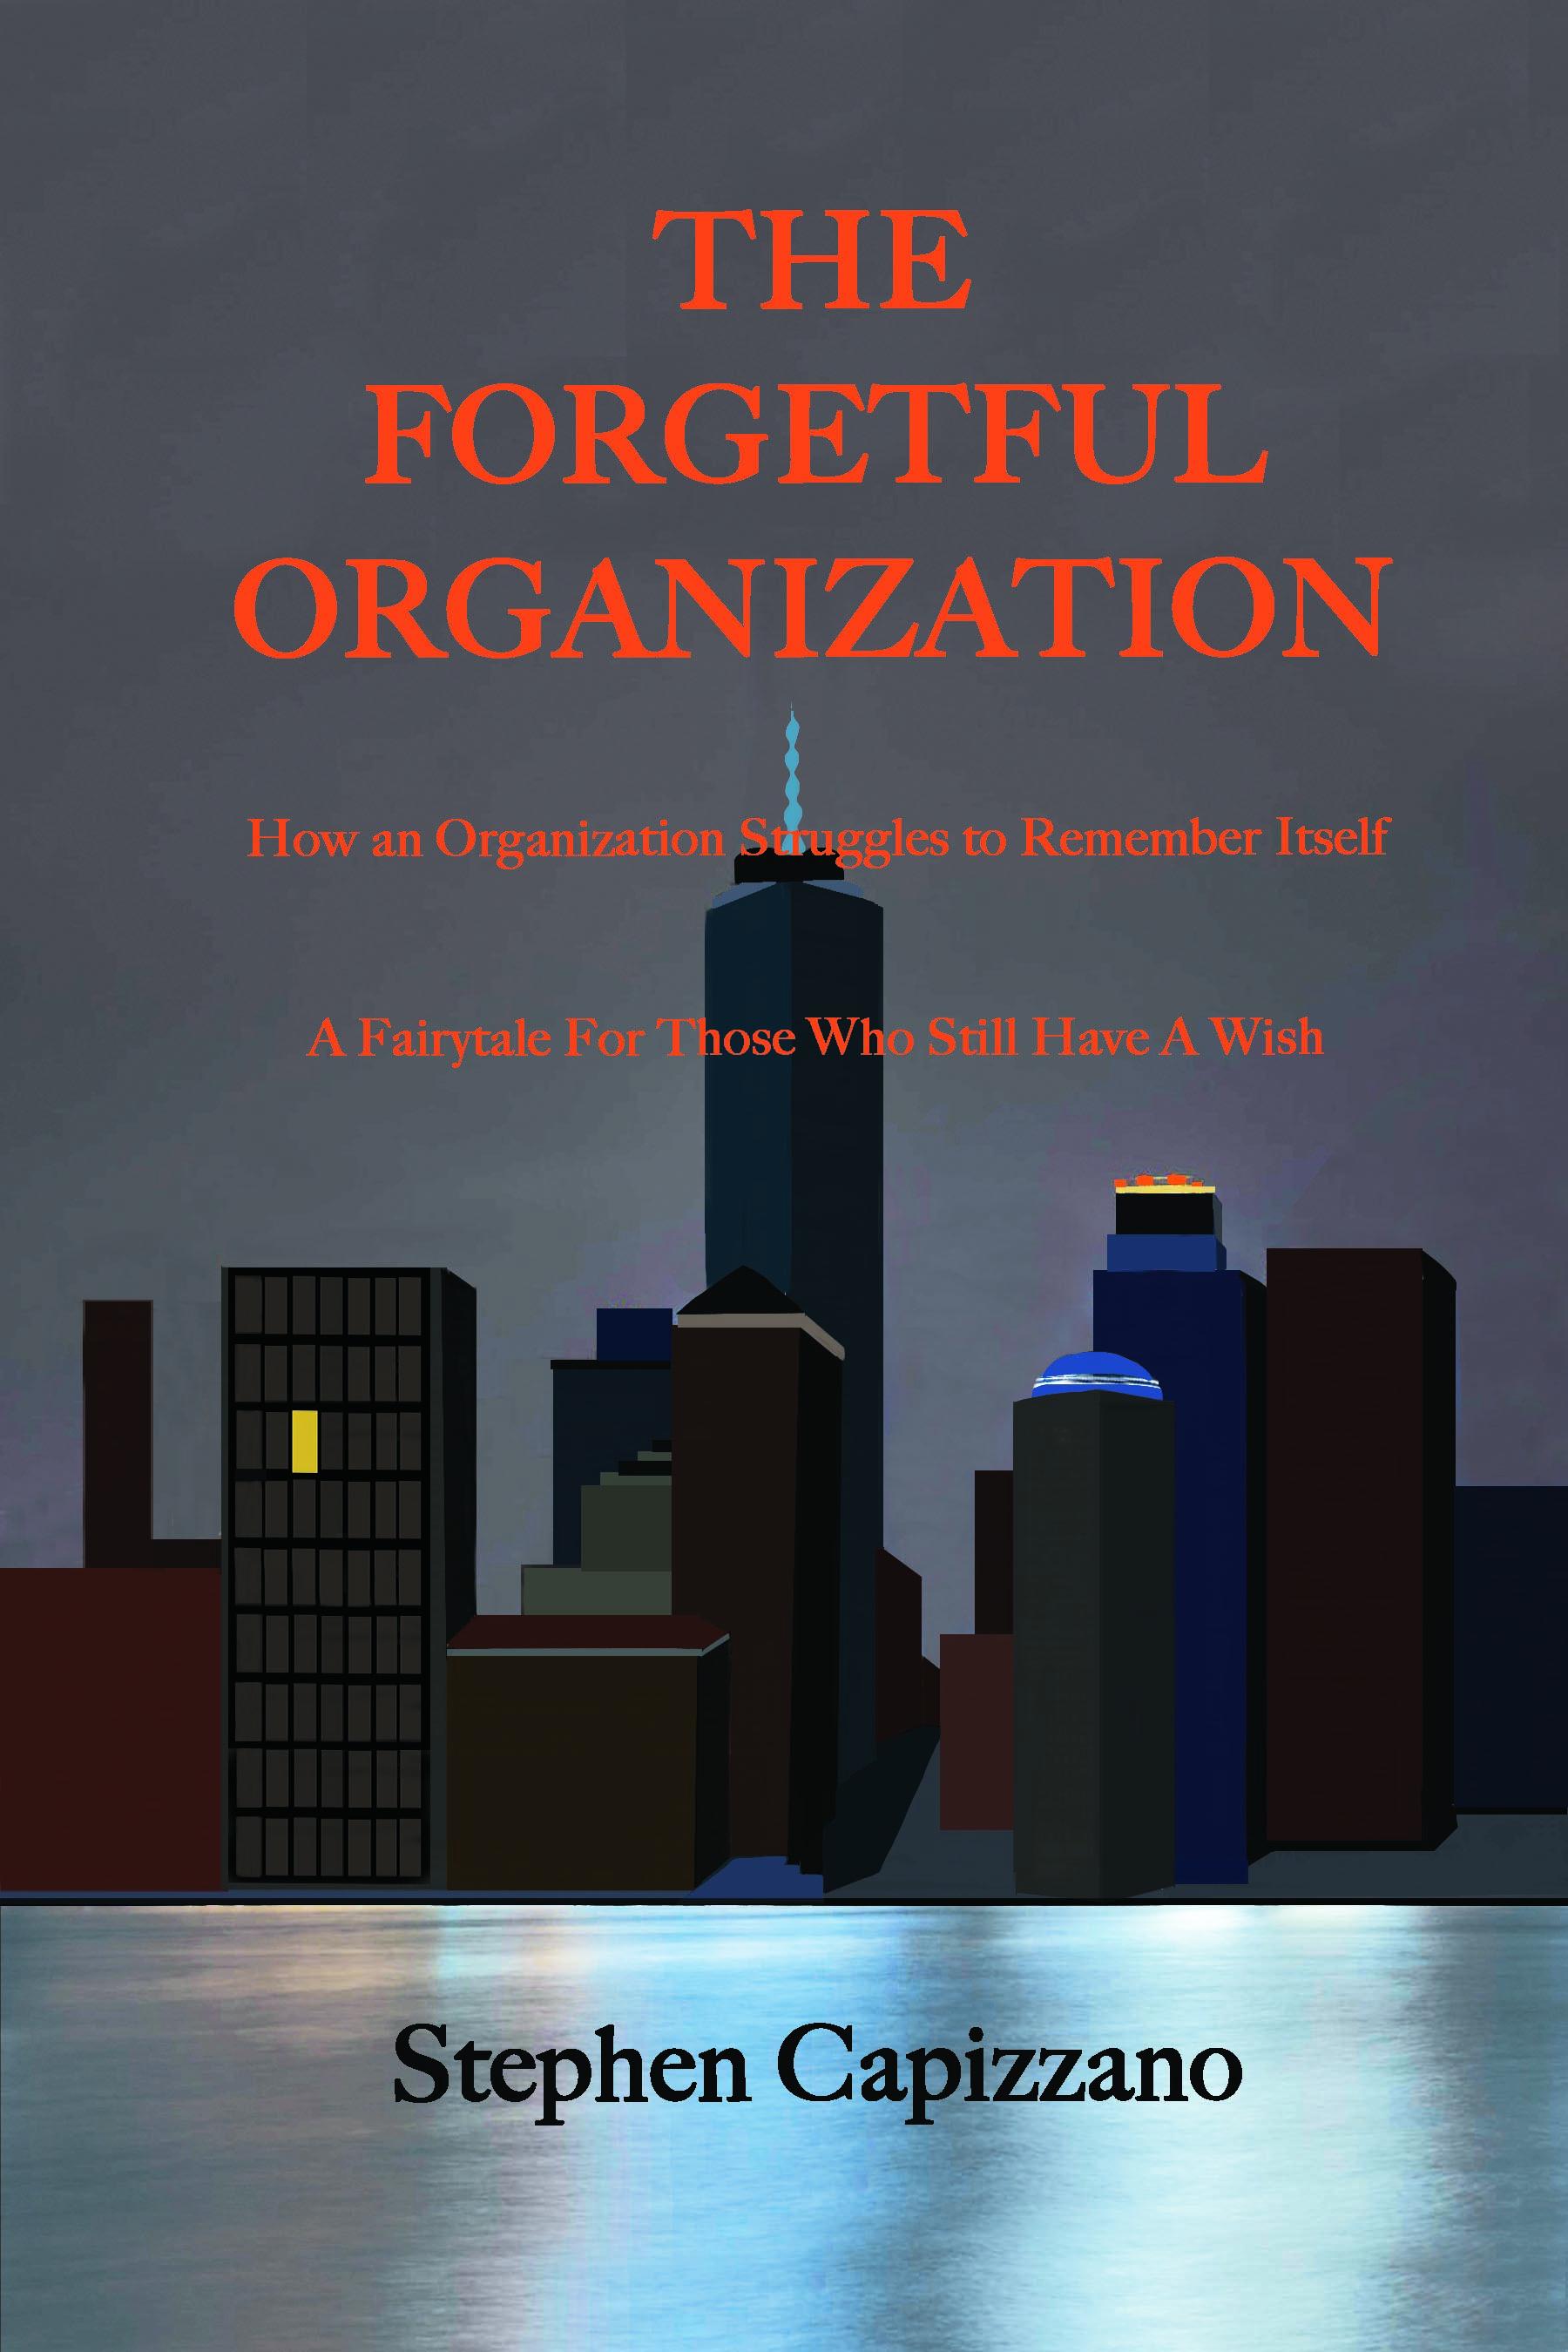 The Forgetful Organization